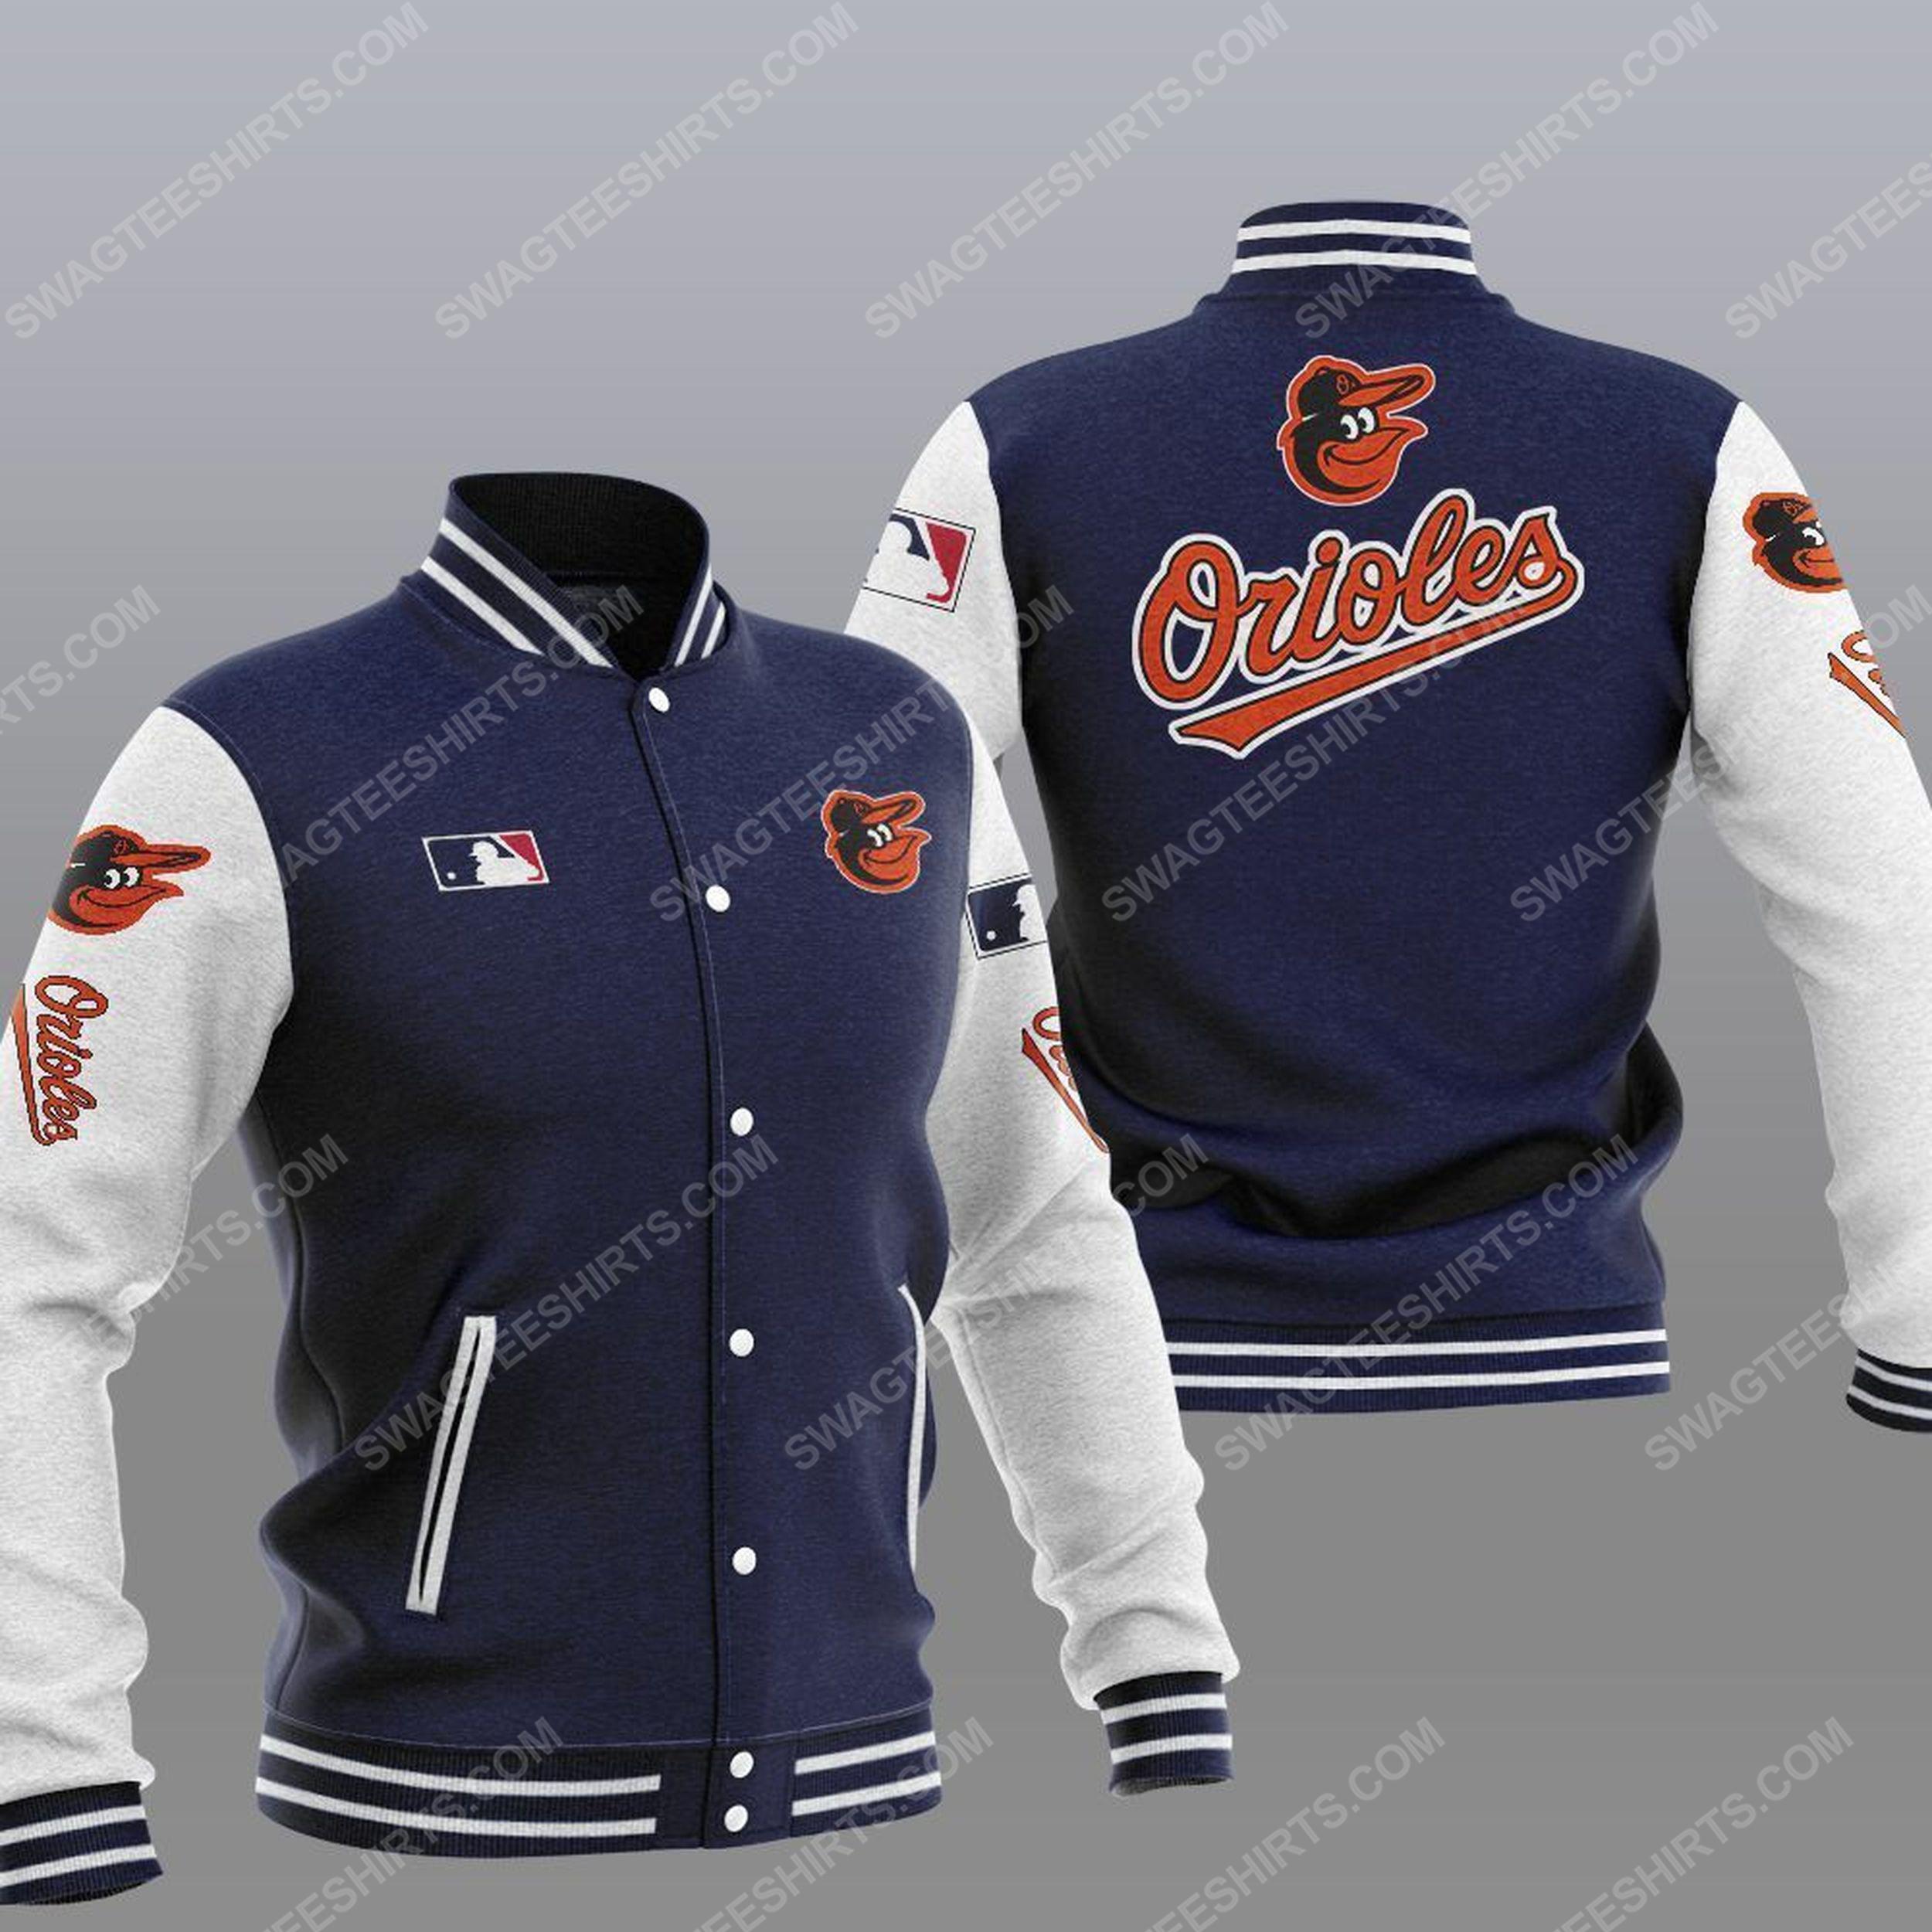 The baltimore orioles mlb all over print baseball jacket - navy 1